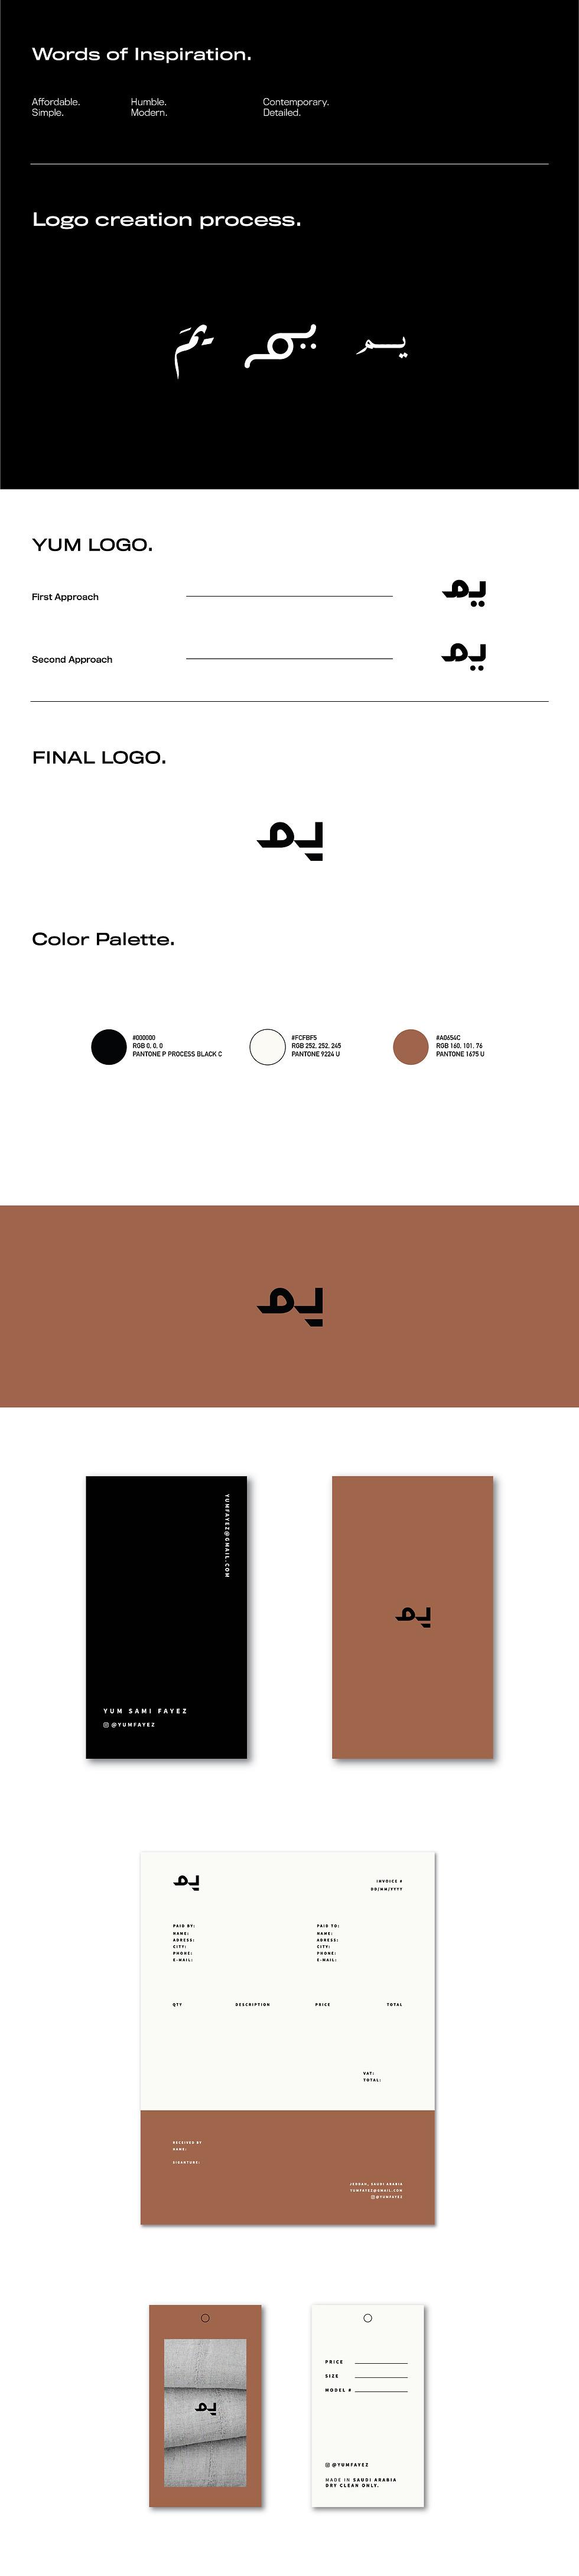 YUM| PROCESS-01.jpg